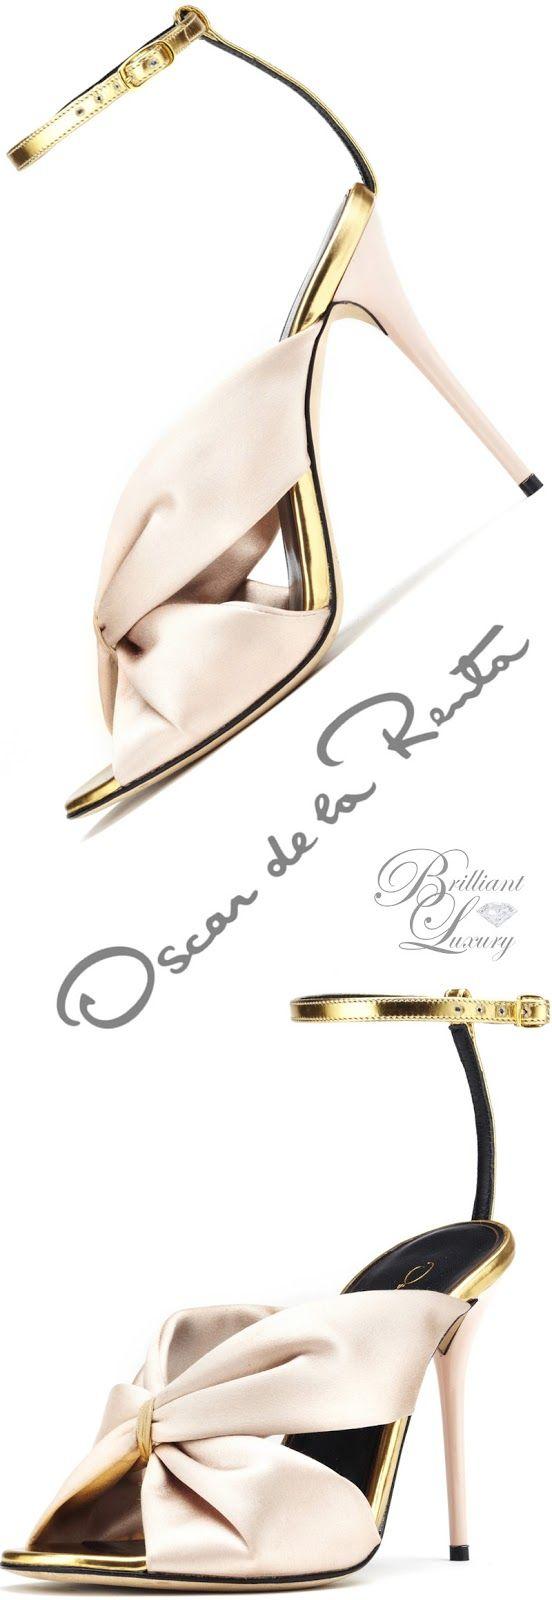 Brilliant Luxury ♦ Oscar de la Renta 'Angelica' Bisque Satin & Specchio Sandals